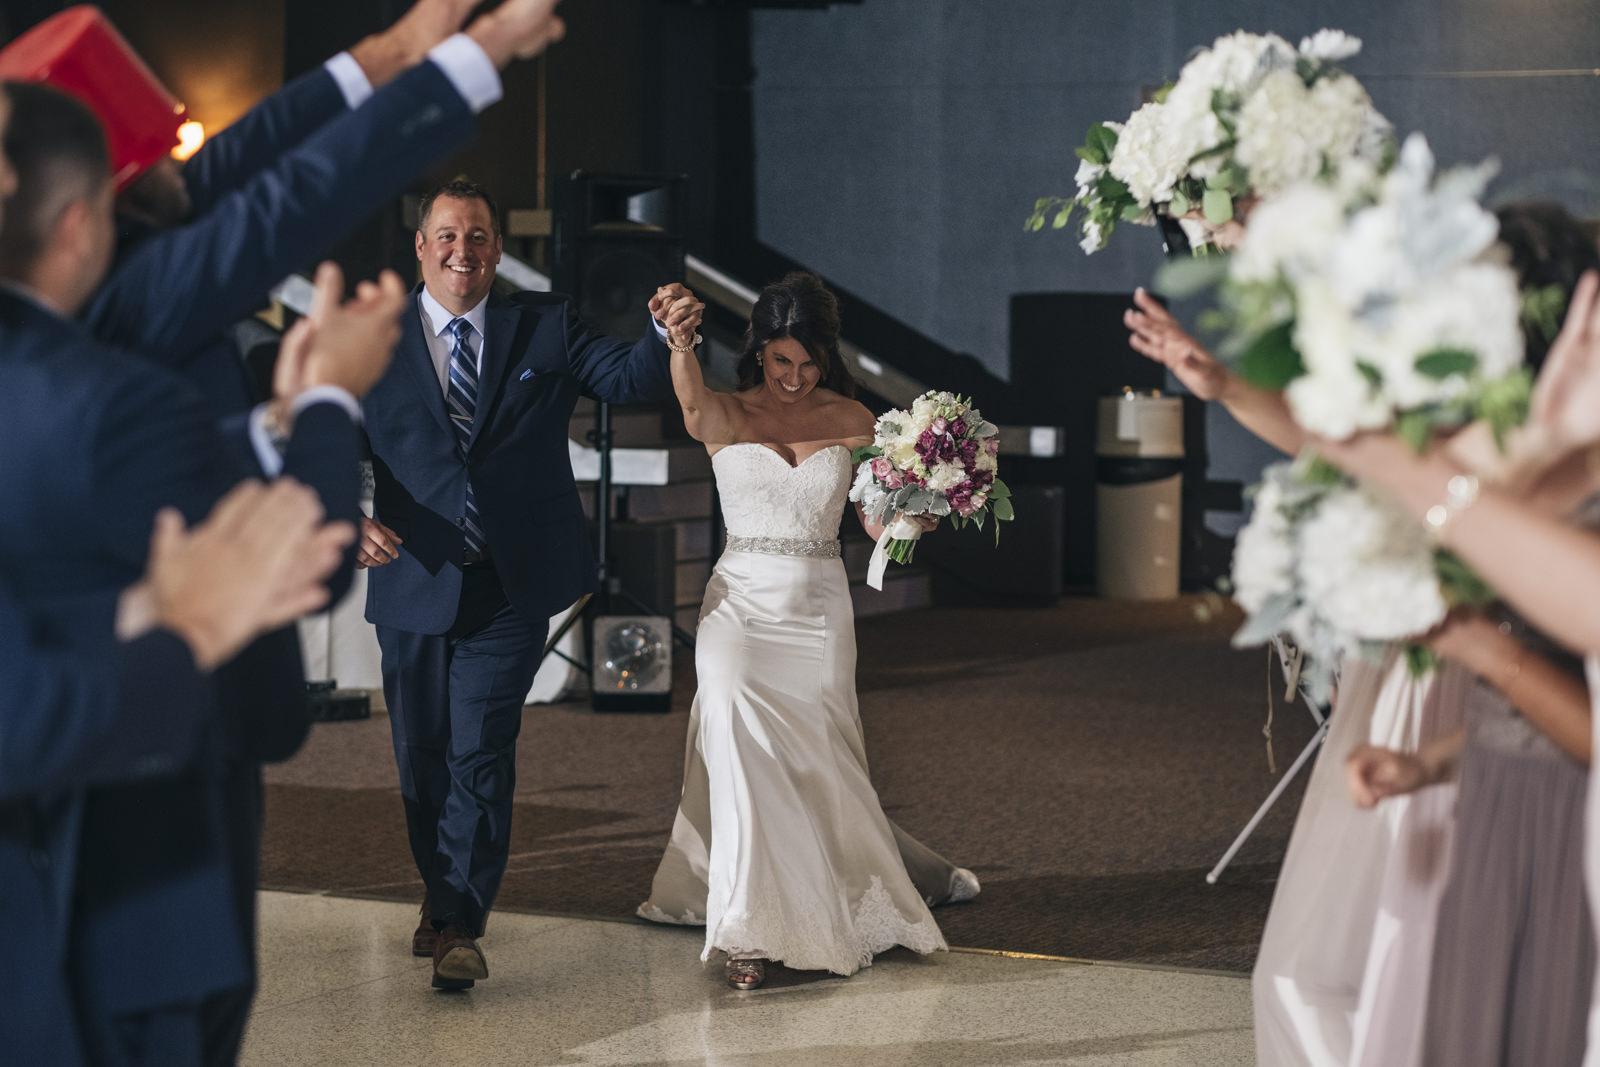 Bride and groom enter their wedding reception in Toledo, Ohio.